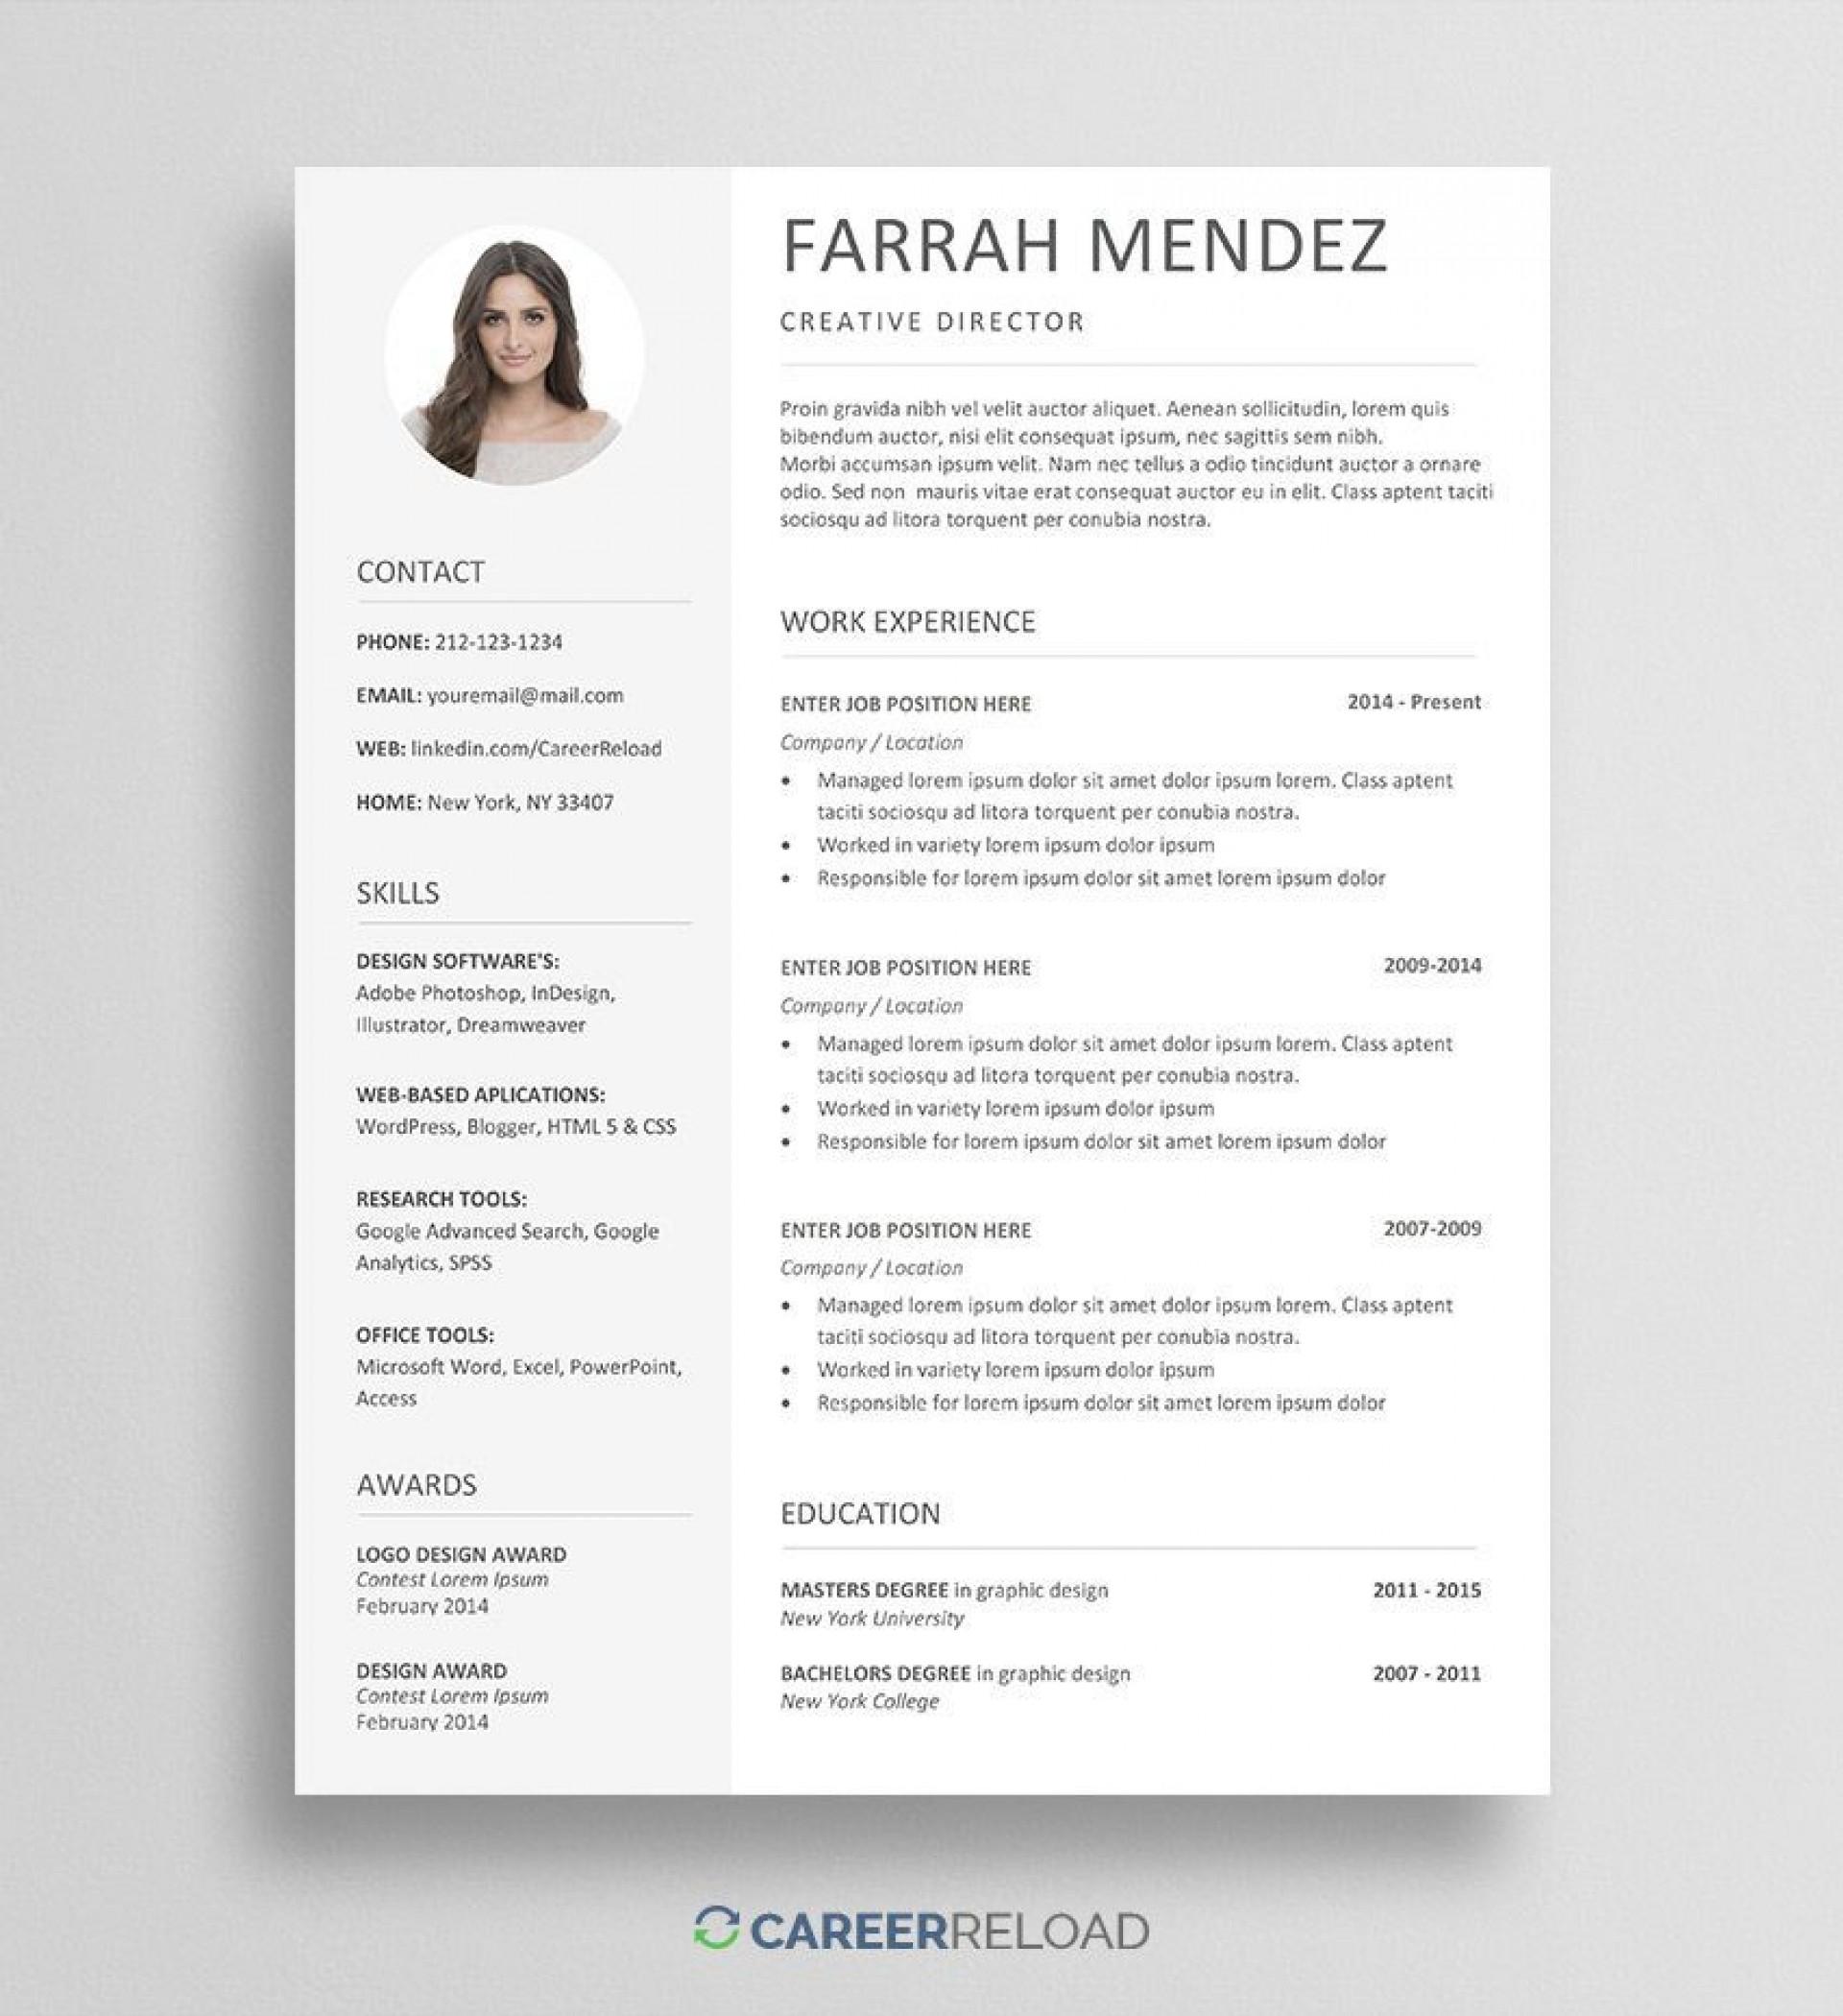 003 Beautiful Download Resume Sample Free Inspiration  Teacher Cv Graphic Designer Word Format Nurse Template1920